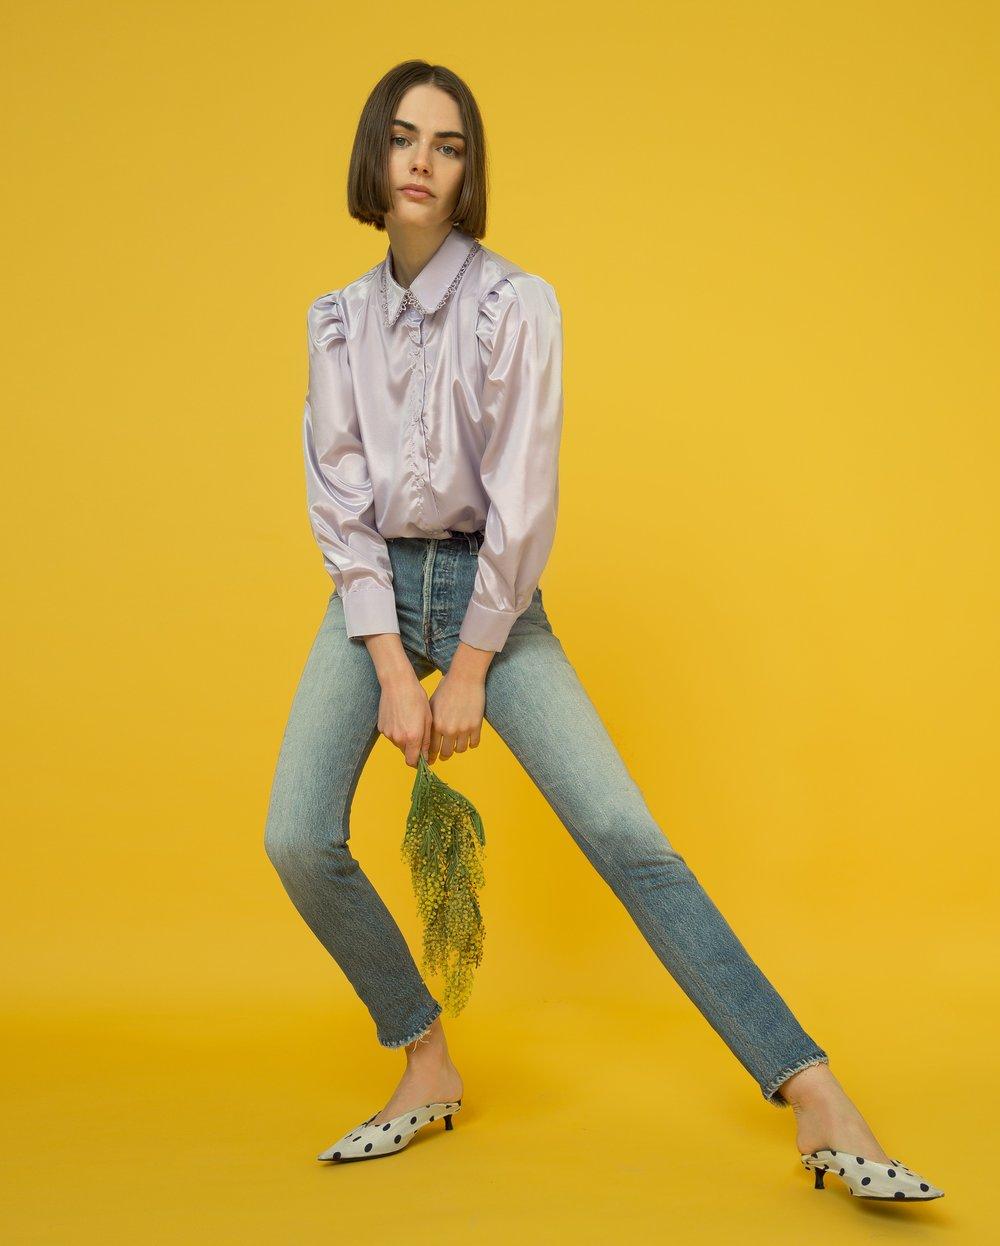 Vivian lavendar satin blouse by Pixie Market